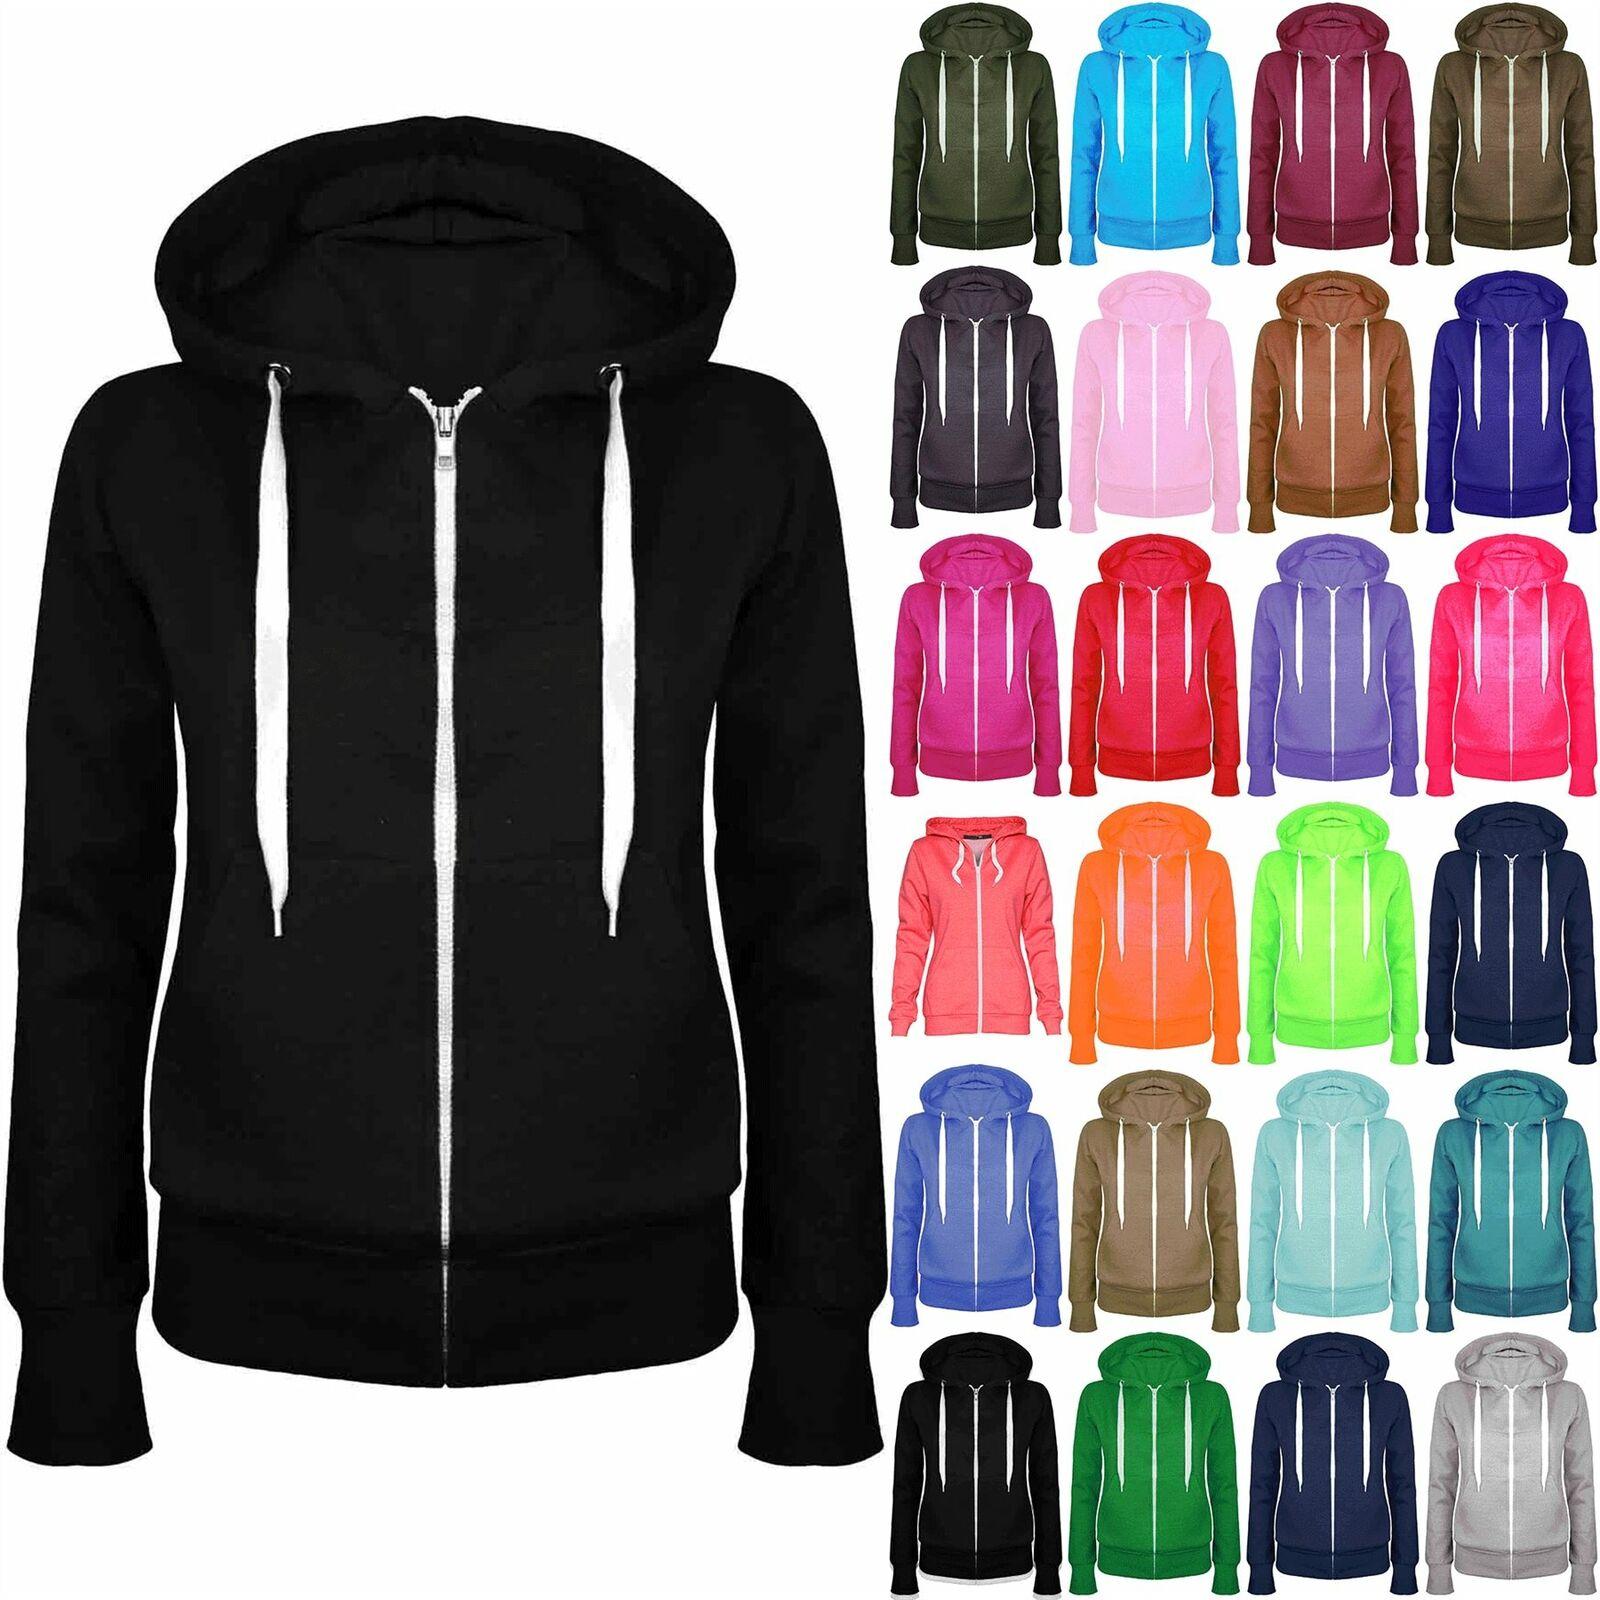 Womens Ladies Plain Fleece Hoody Zip Top Side Pockets Hoodies Sweatshirt Jacket